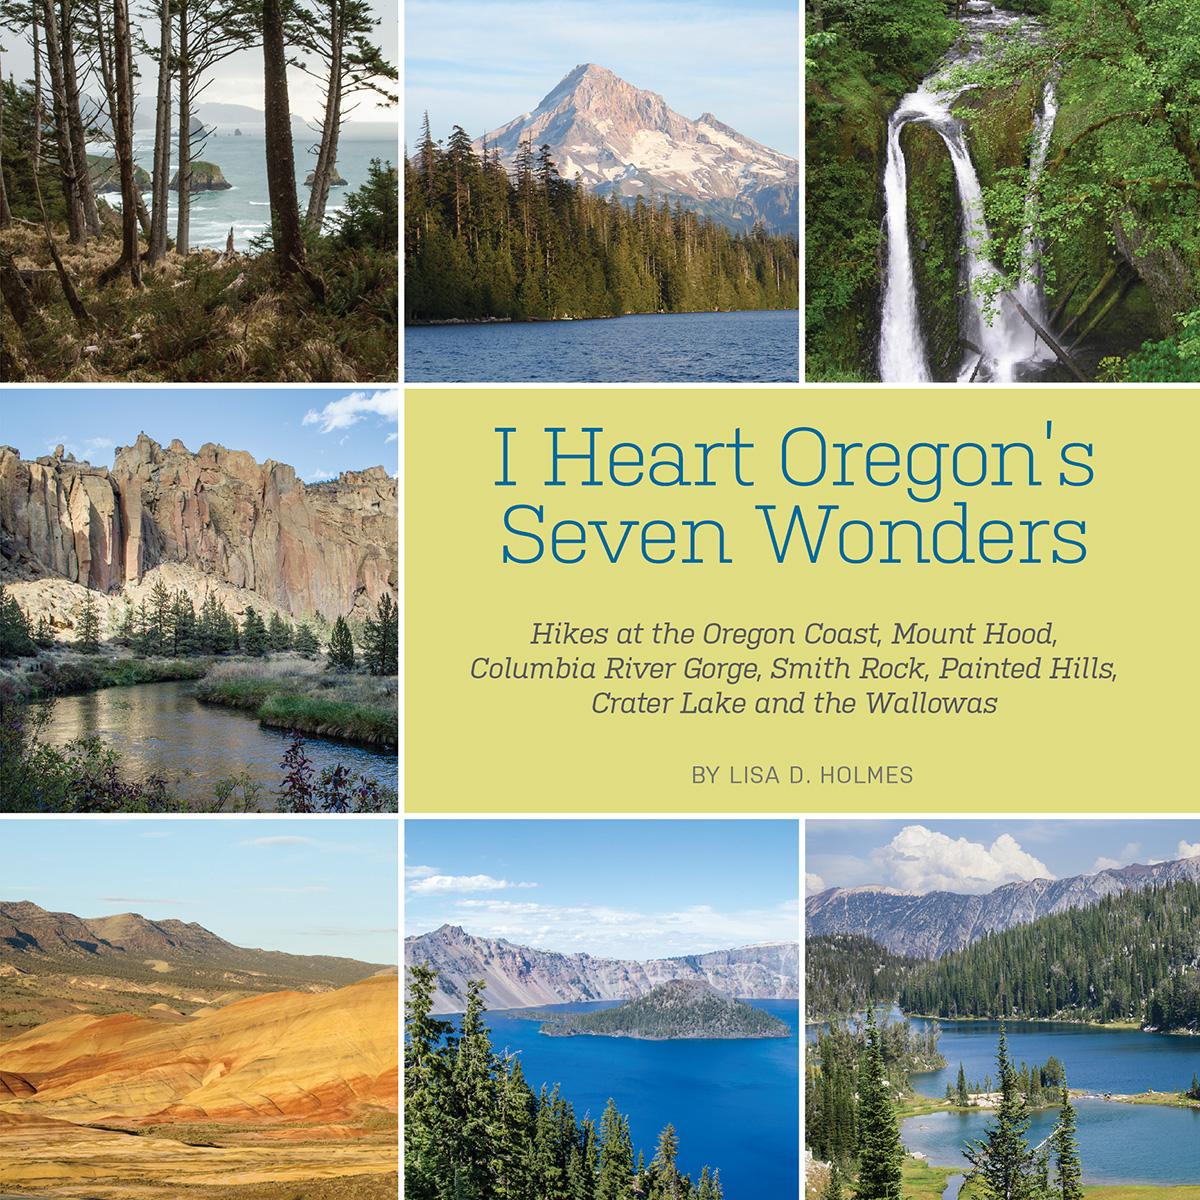 I Heart Oregon's Seven Wonders hiking book